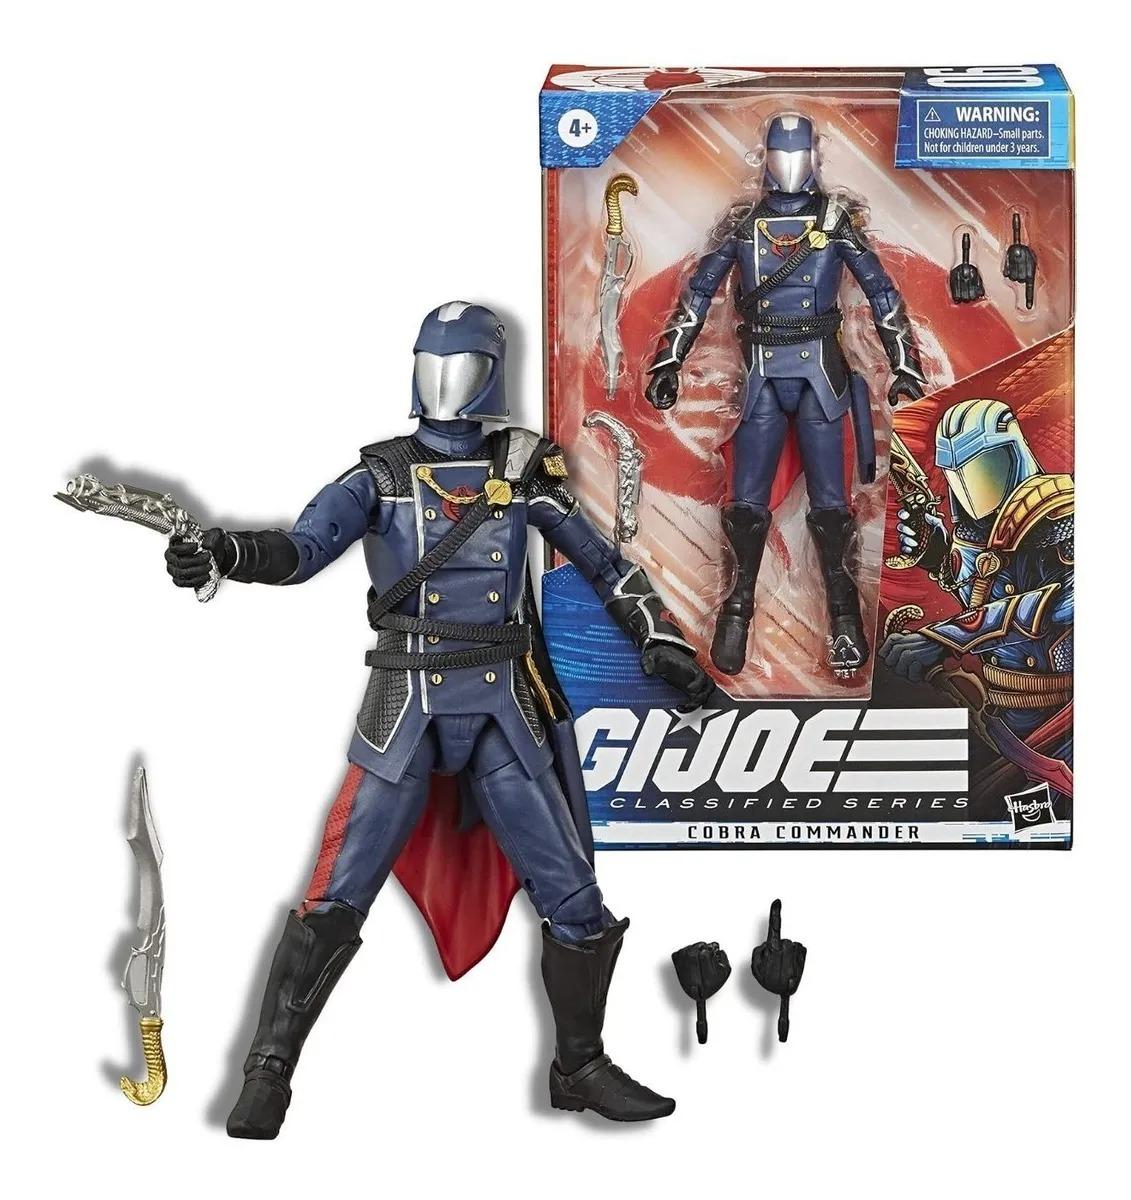 Gi Joe Classified Series Elite 06  Boneco Cobra Commander 16 cm  - Hasbro